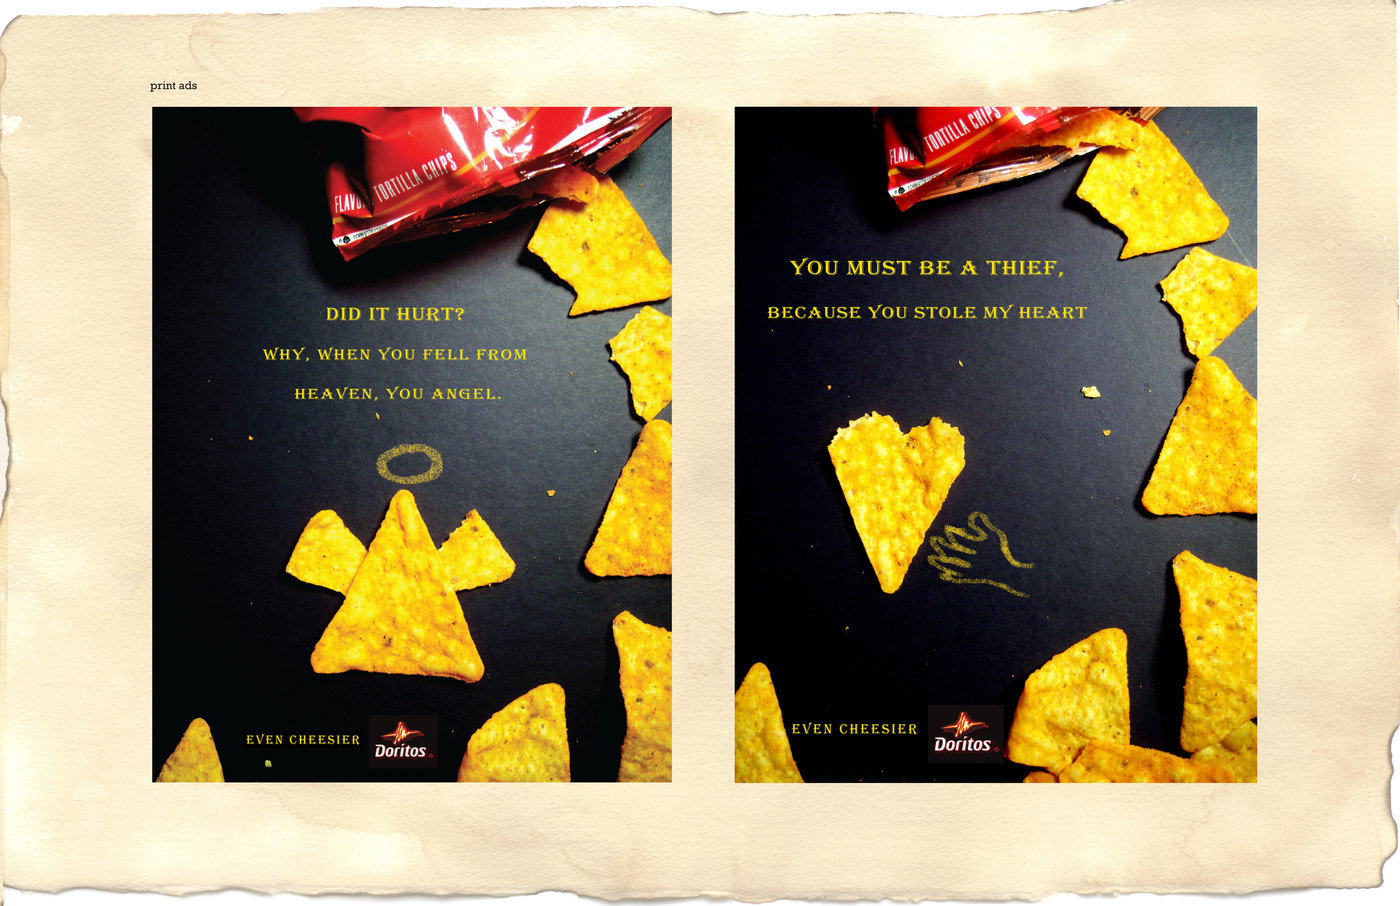 Doritos By Jennifer Waterman At Coroflot Com